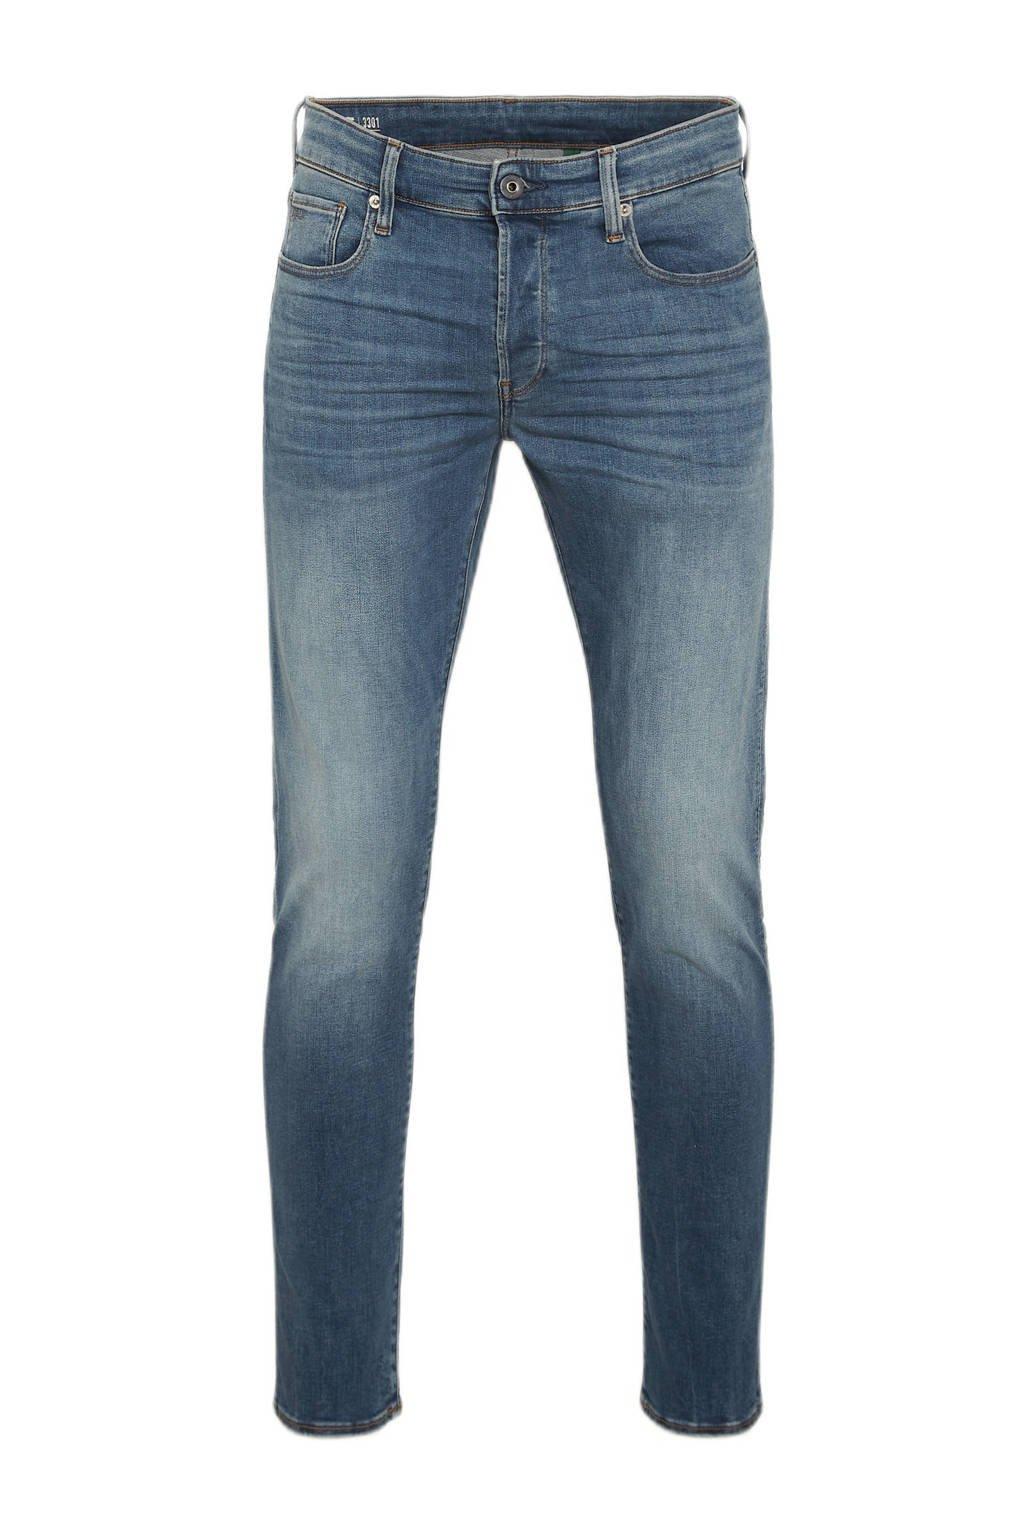 G-Star RAW  straight 3301 straight fit jeans, Dark denim